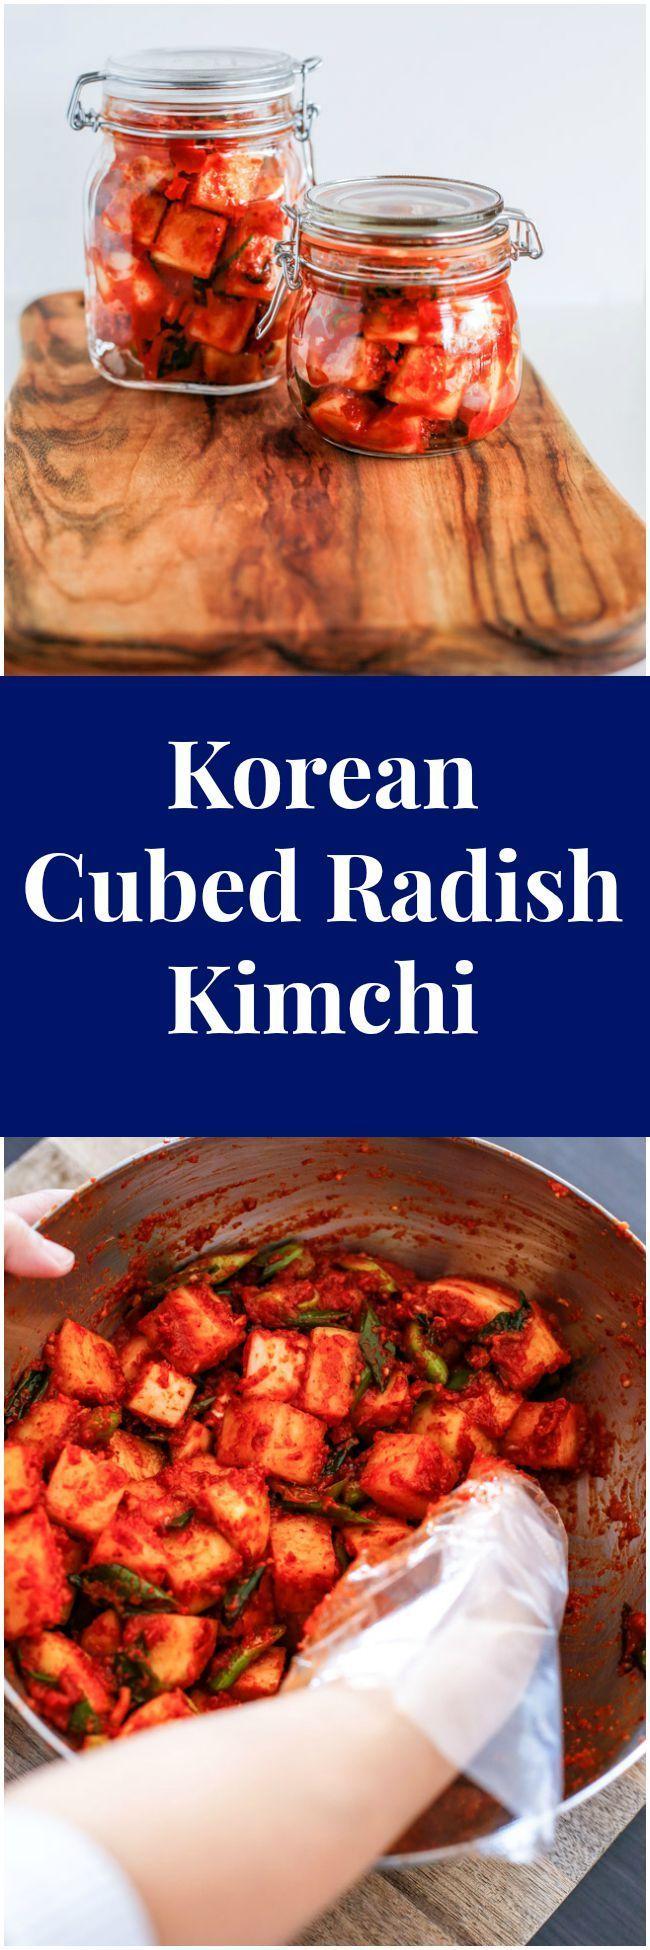 How to make authentic Korean cubed radish Kimchi (KKakdugi) | MyKoreanKitchen.com